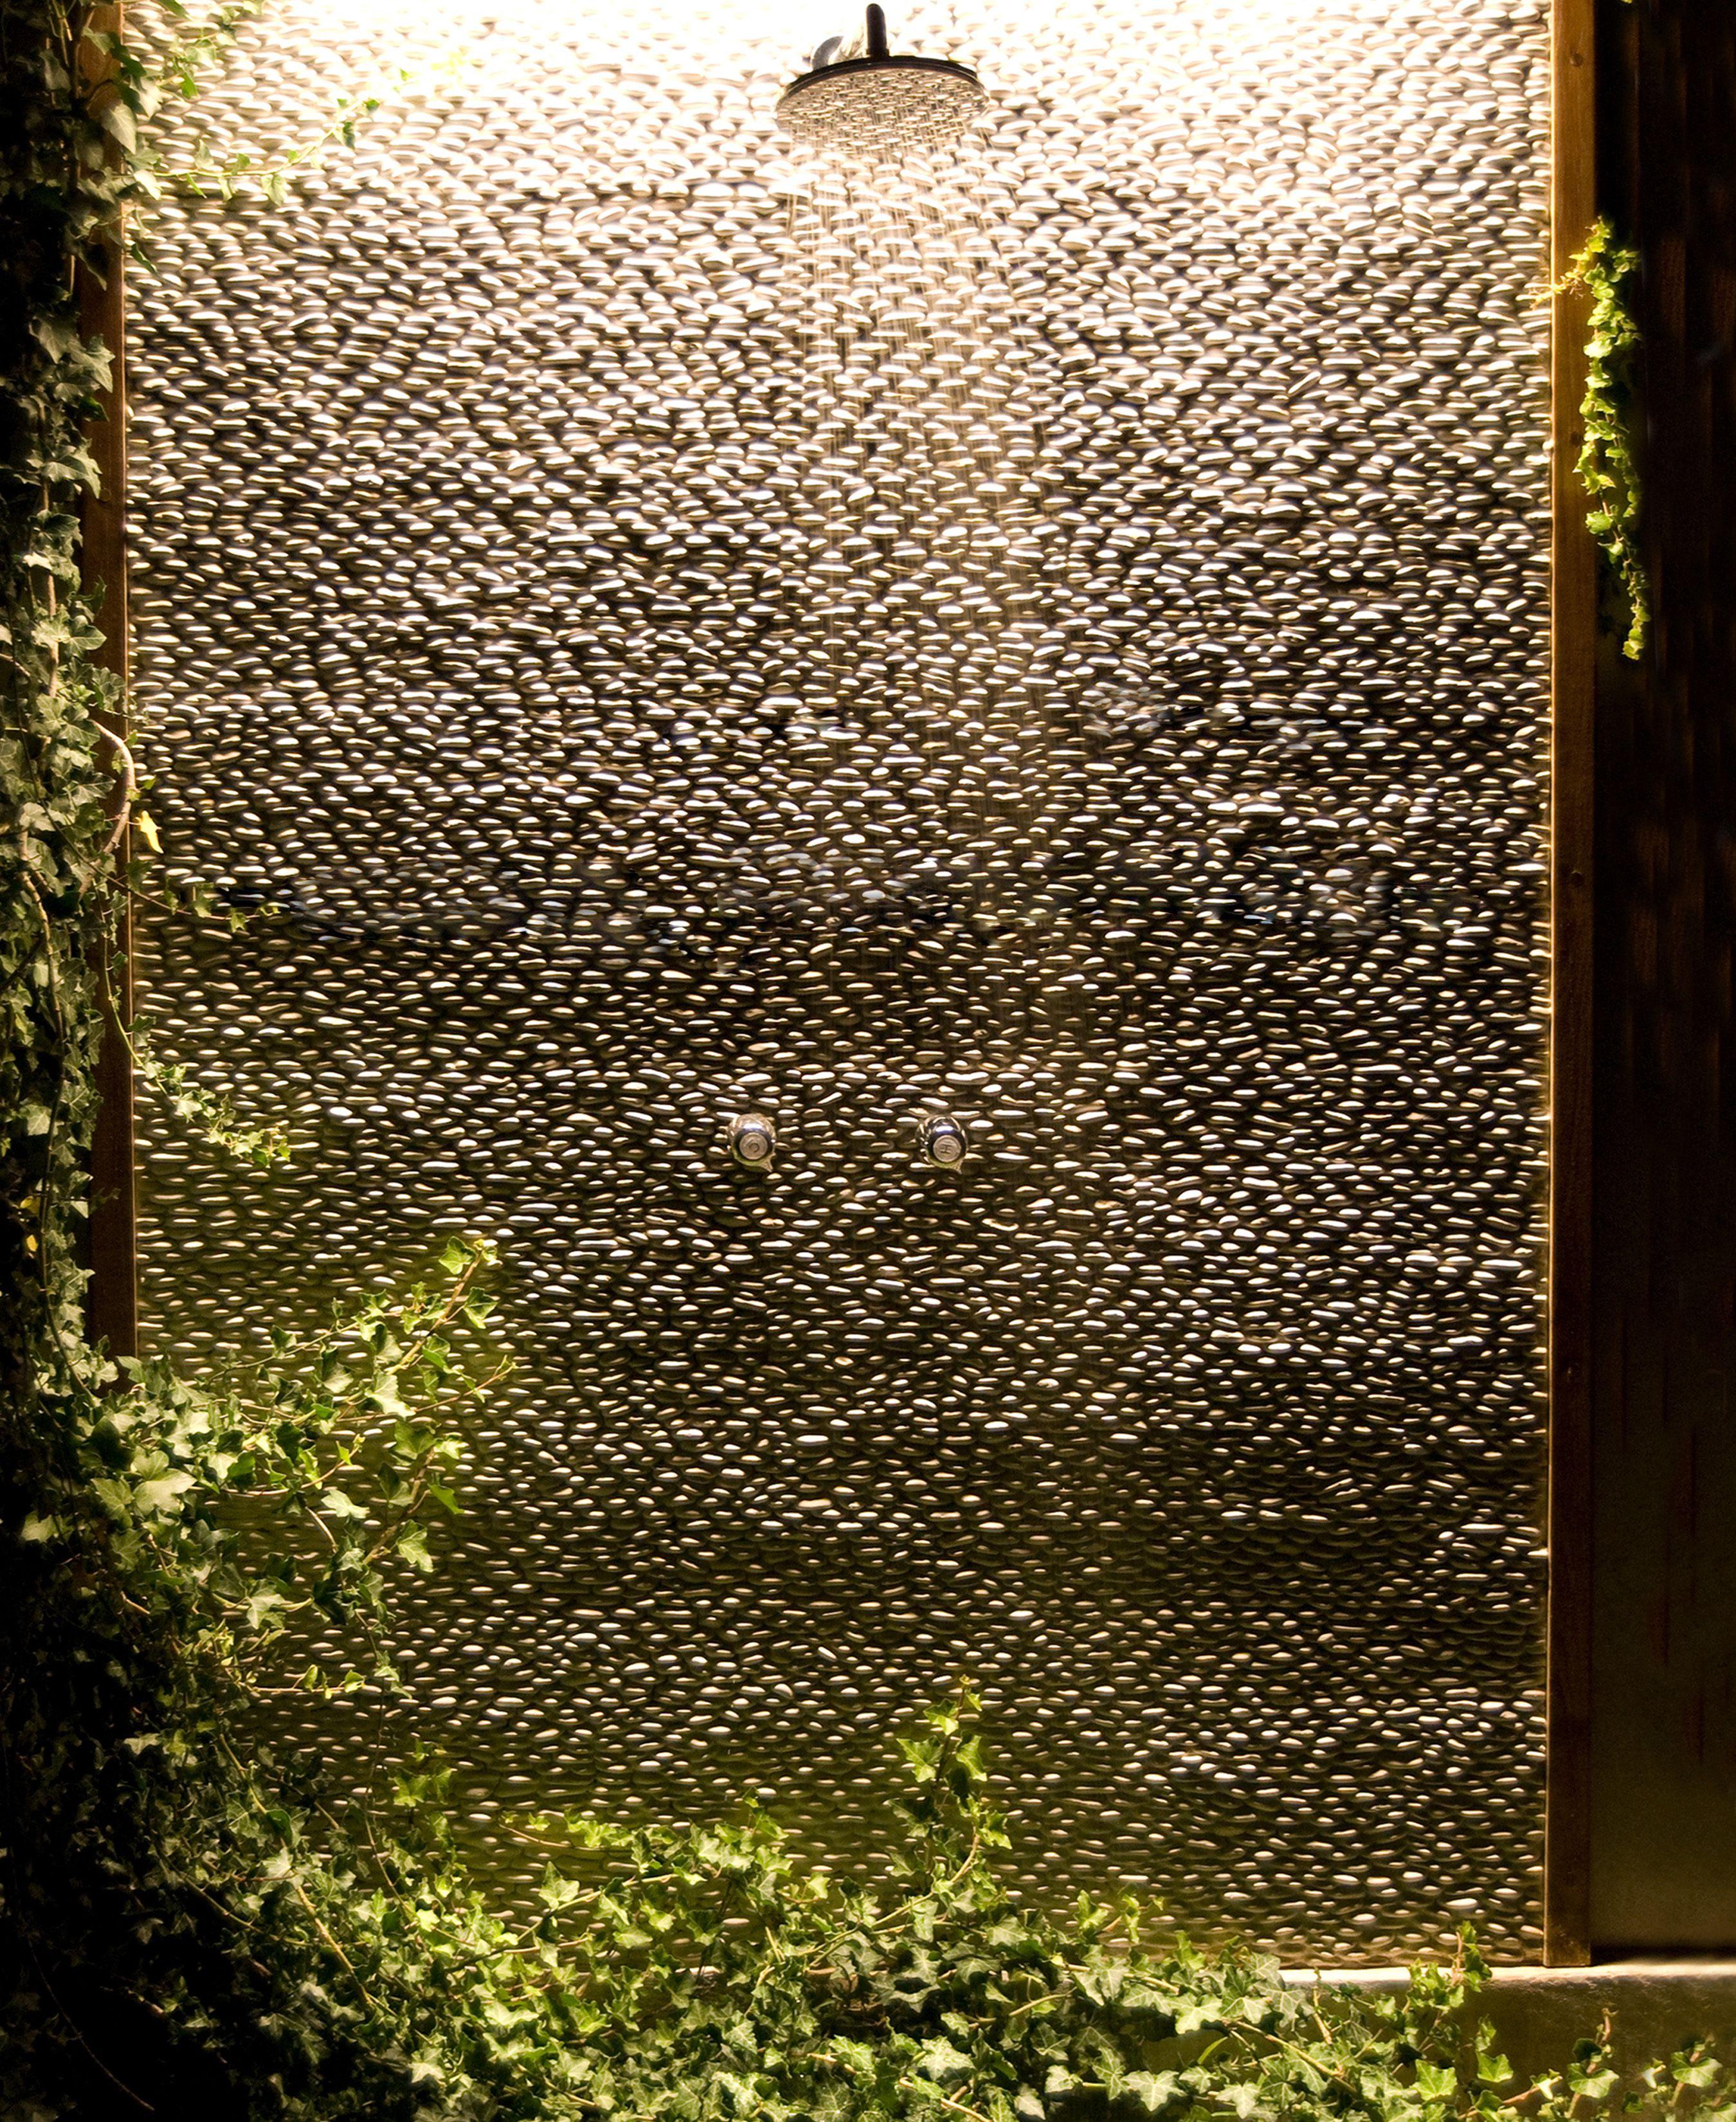 Illuminate textured walls  Modern LED Lighting for The Bathroom